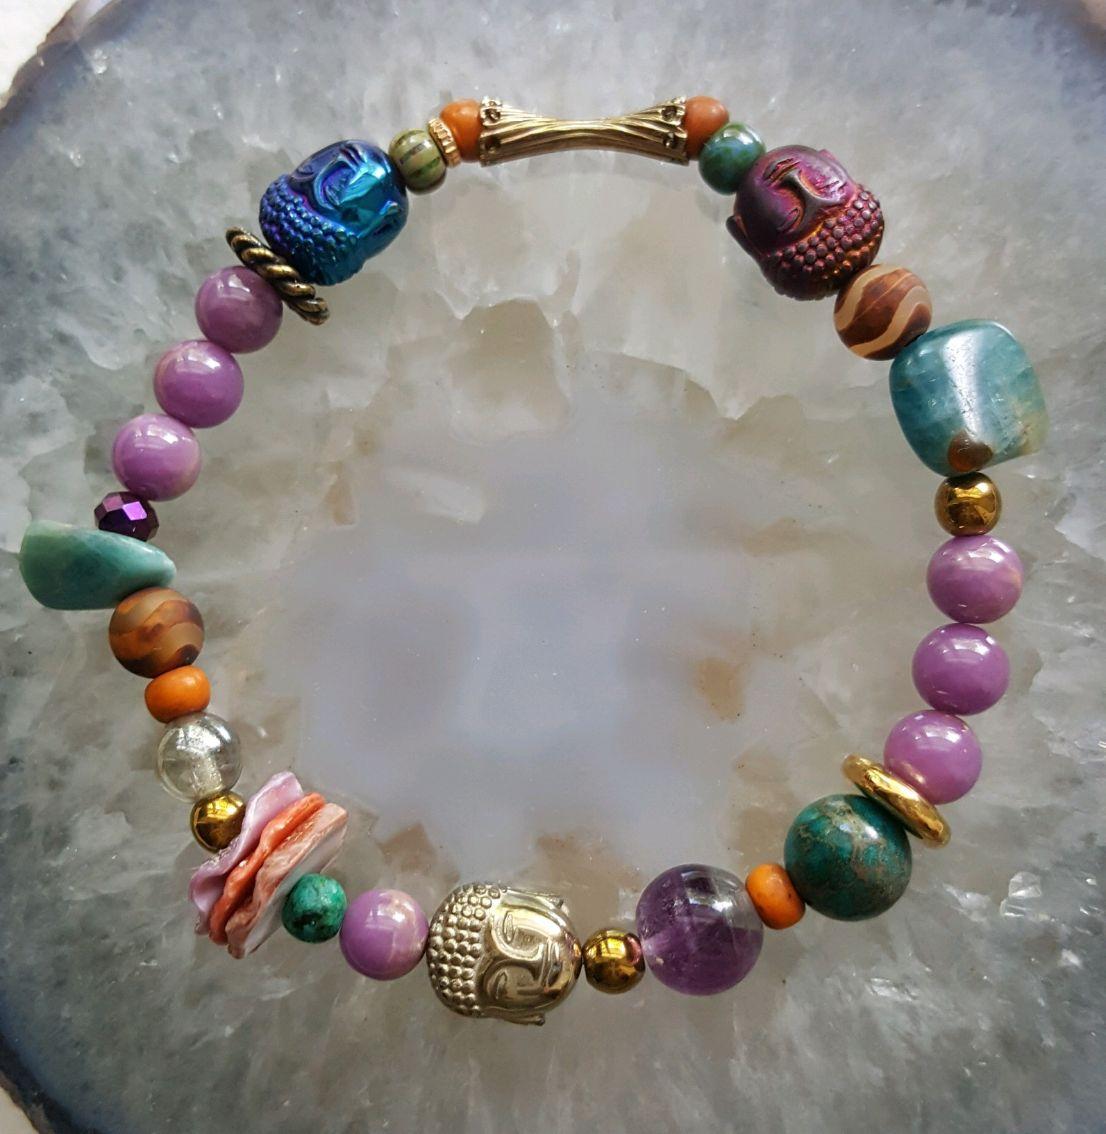 Colorful Hematite Buddhas, Apatite beads, shells, phosphosiderite, elastic